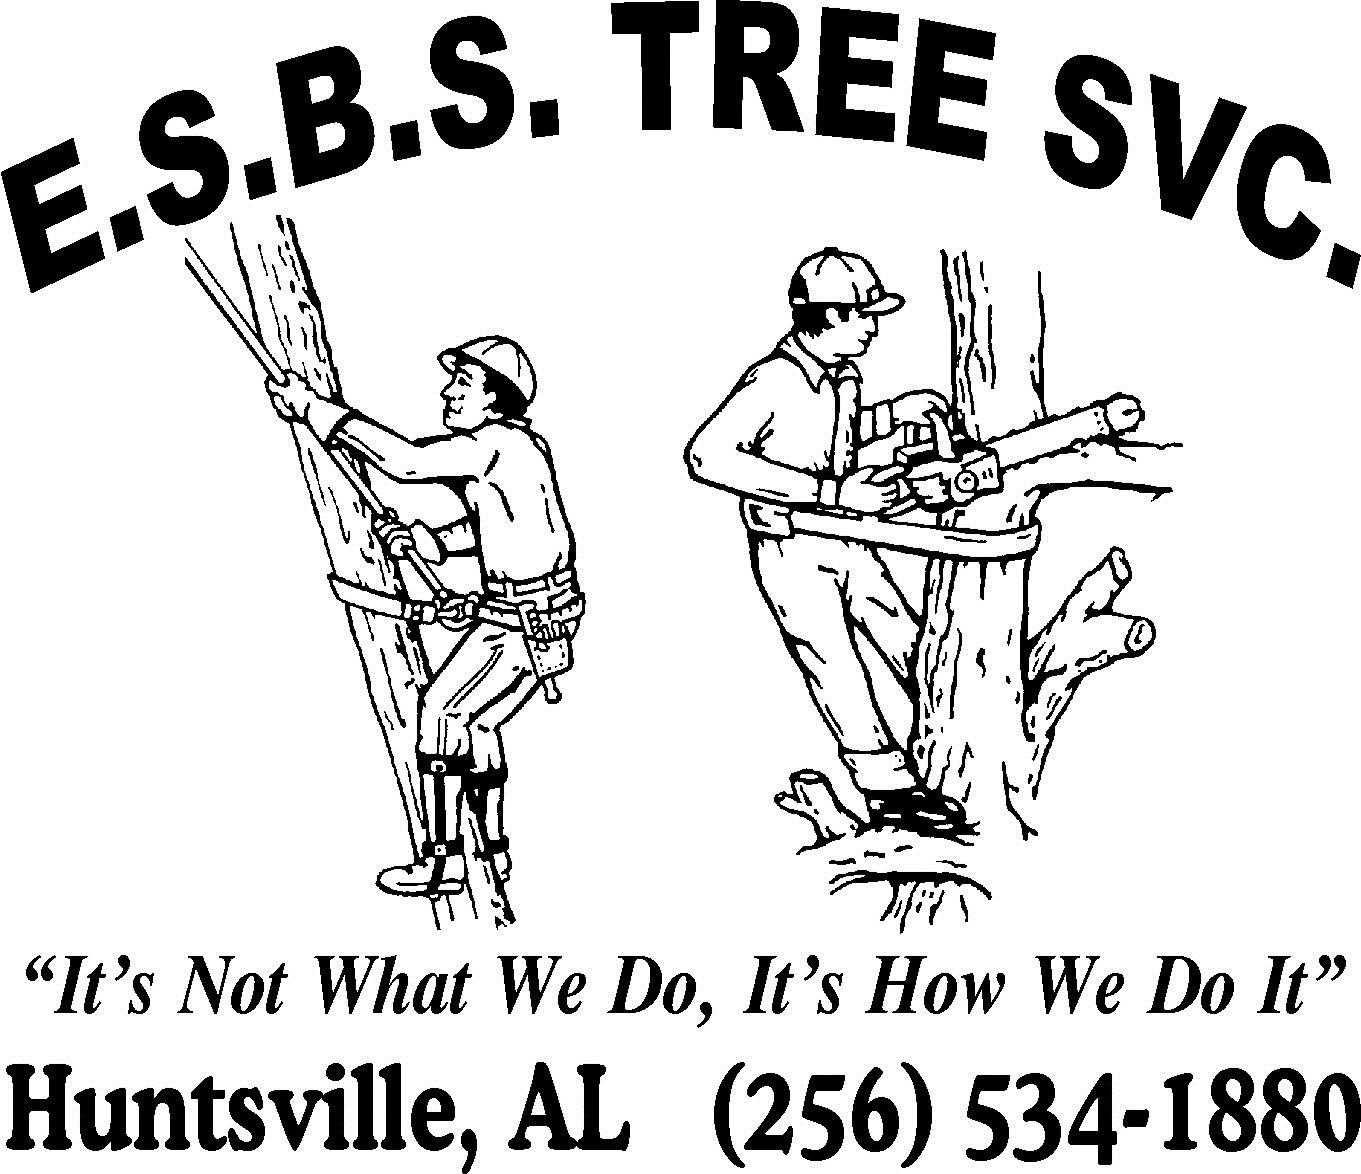 ESBS Tree Services